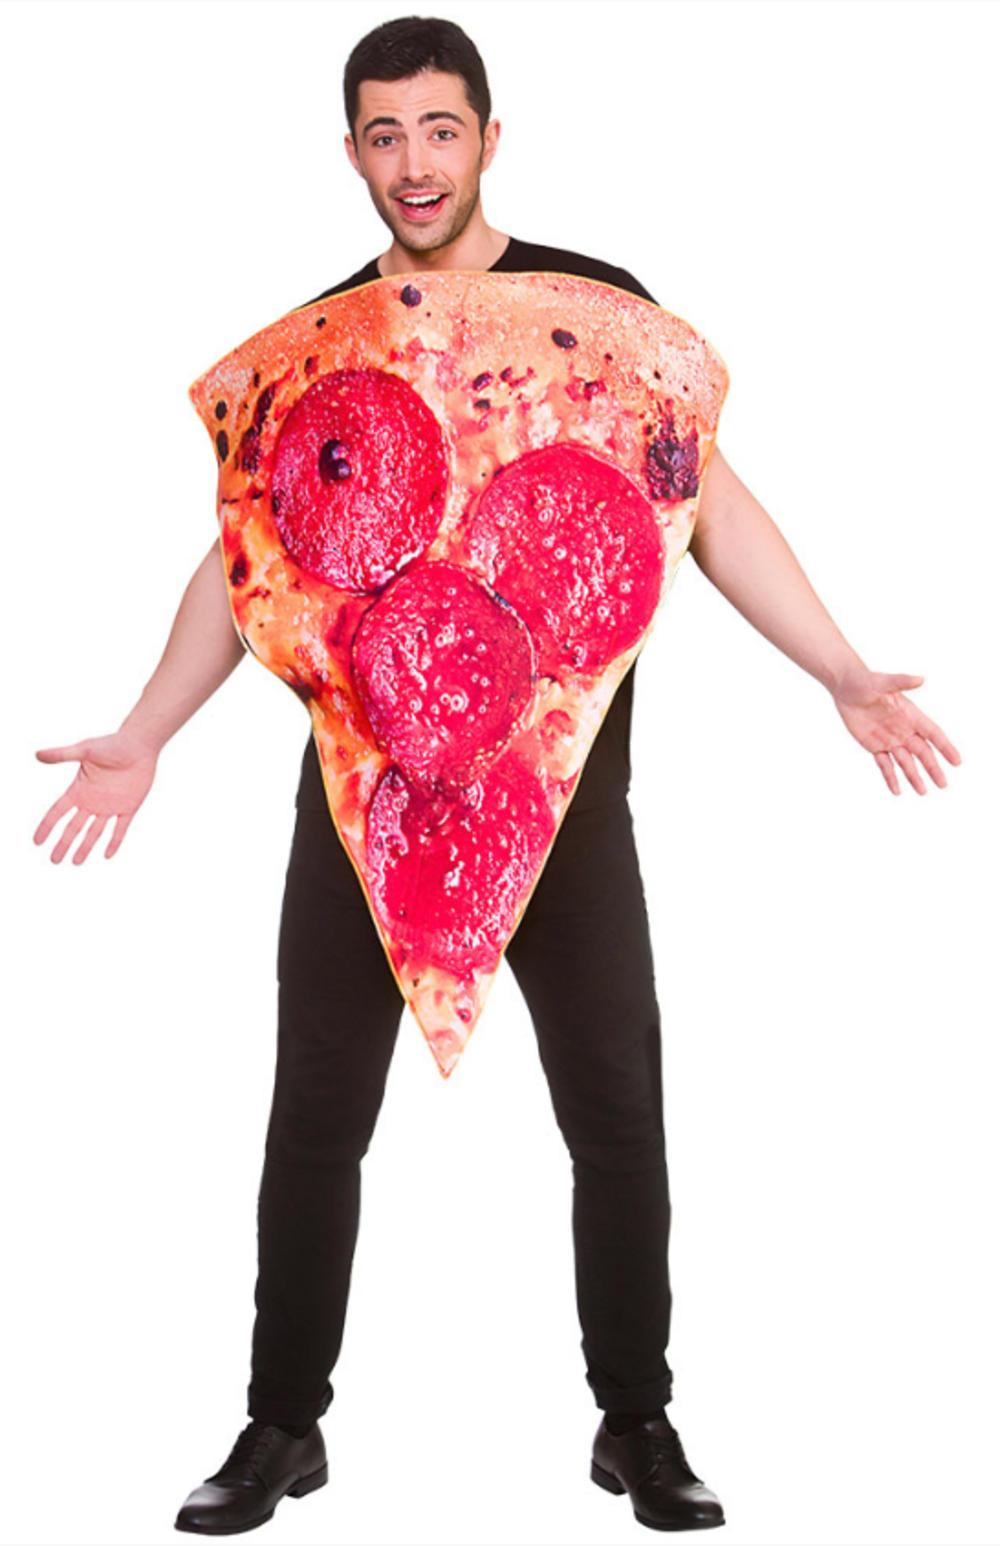 Funny Pizza Slice Costume